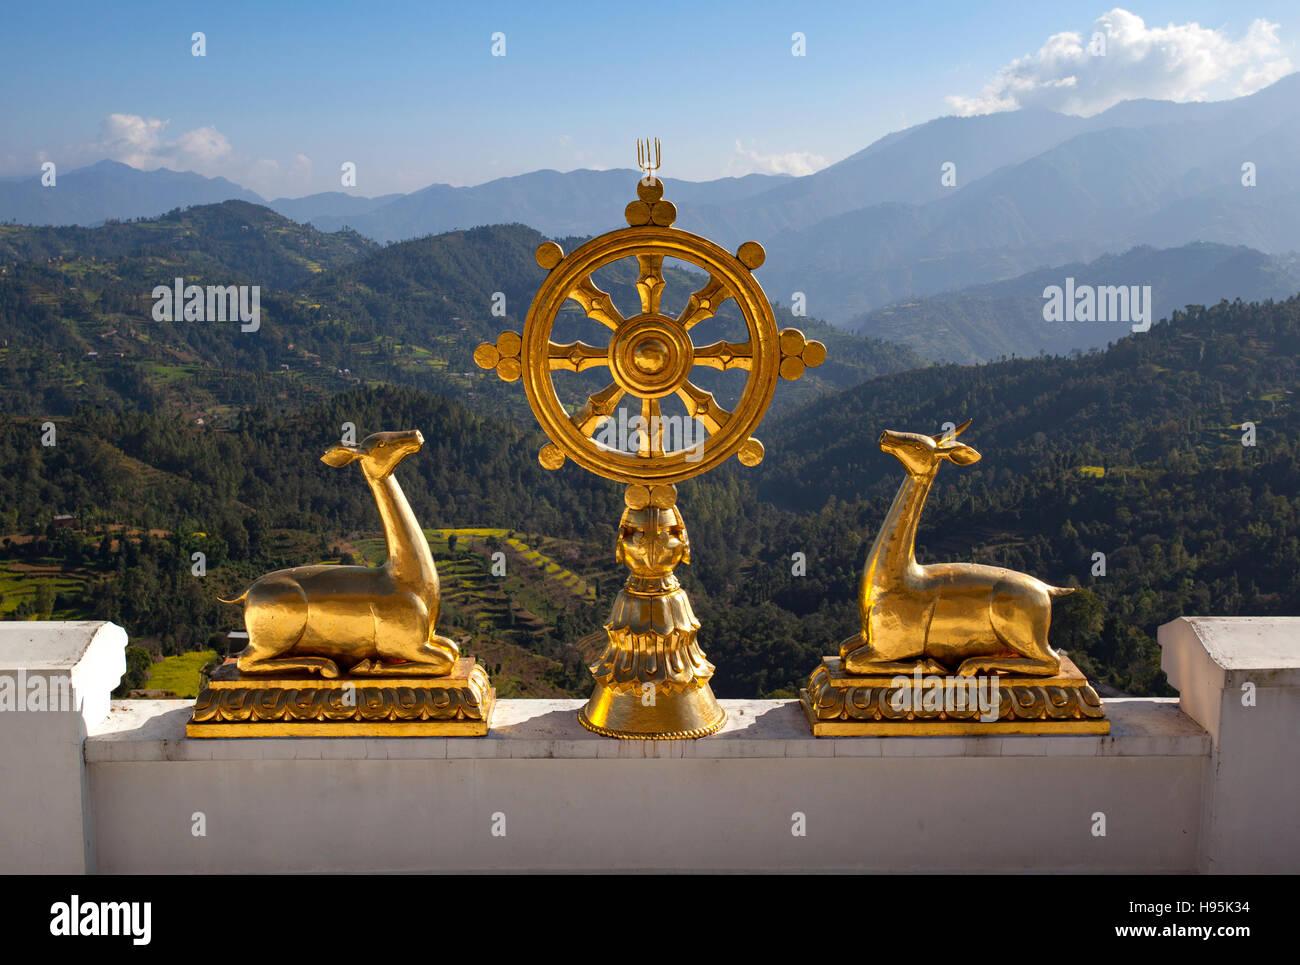 La Roue du Dharma (Dharmacakra) de la Thrangu Tashi Yangtse en monastère bouddhiste Bouddha Namo. Le Népal. Photo Stock